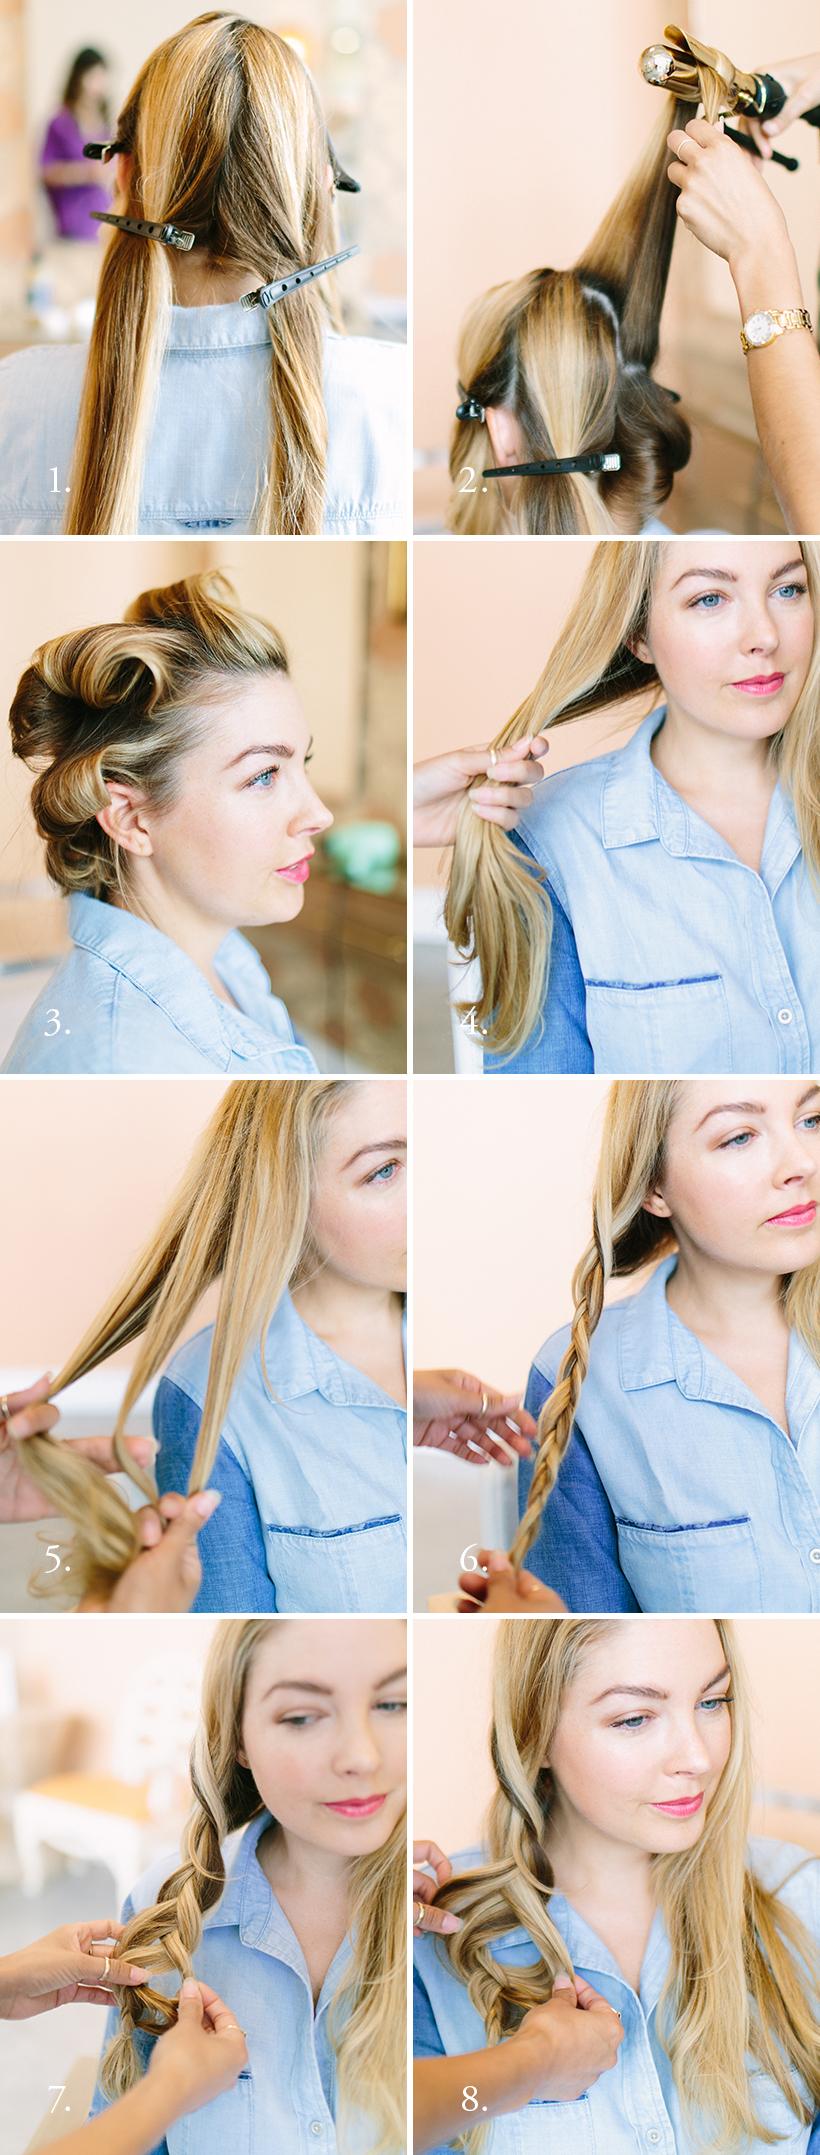 Boho side braid camille styles boho side braid hair tutorial camille styles baditri Choice Image